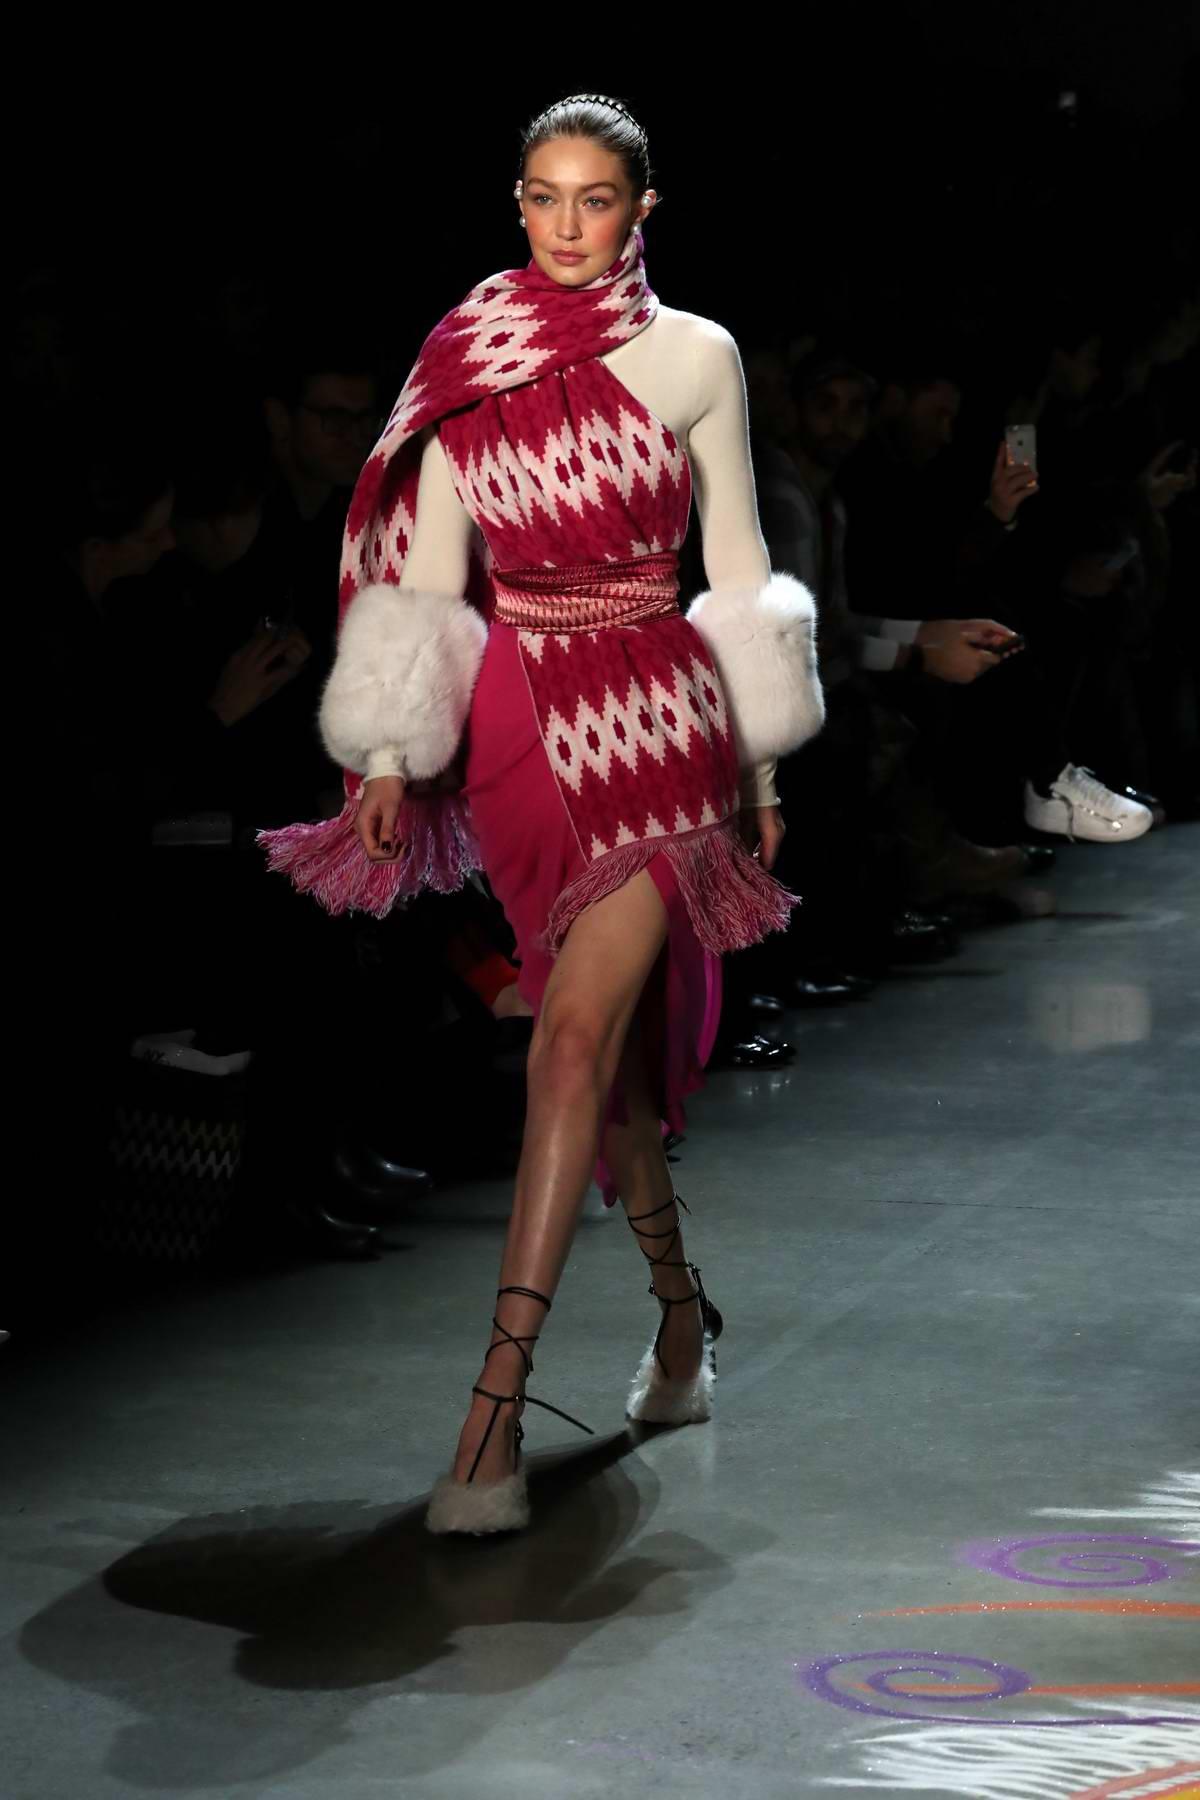 Gigi Hadid walks for Prabal Gurung Show, Fall/Winter 2018 during New York Fashion Week in New York City